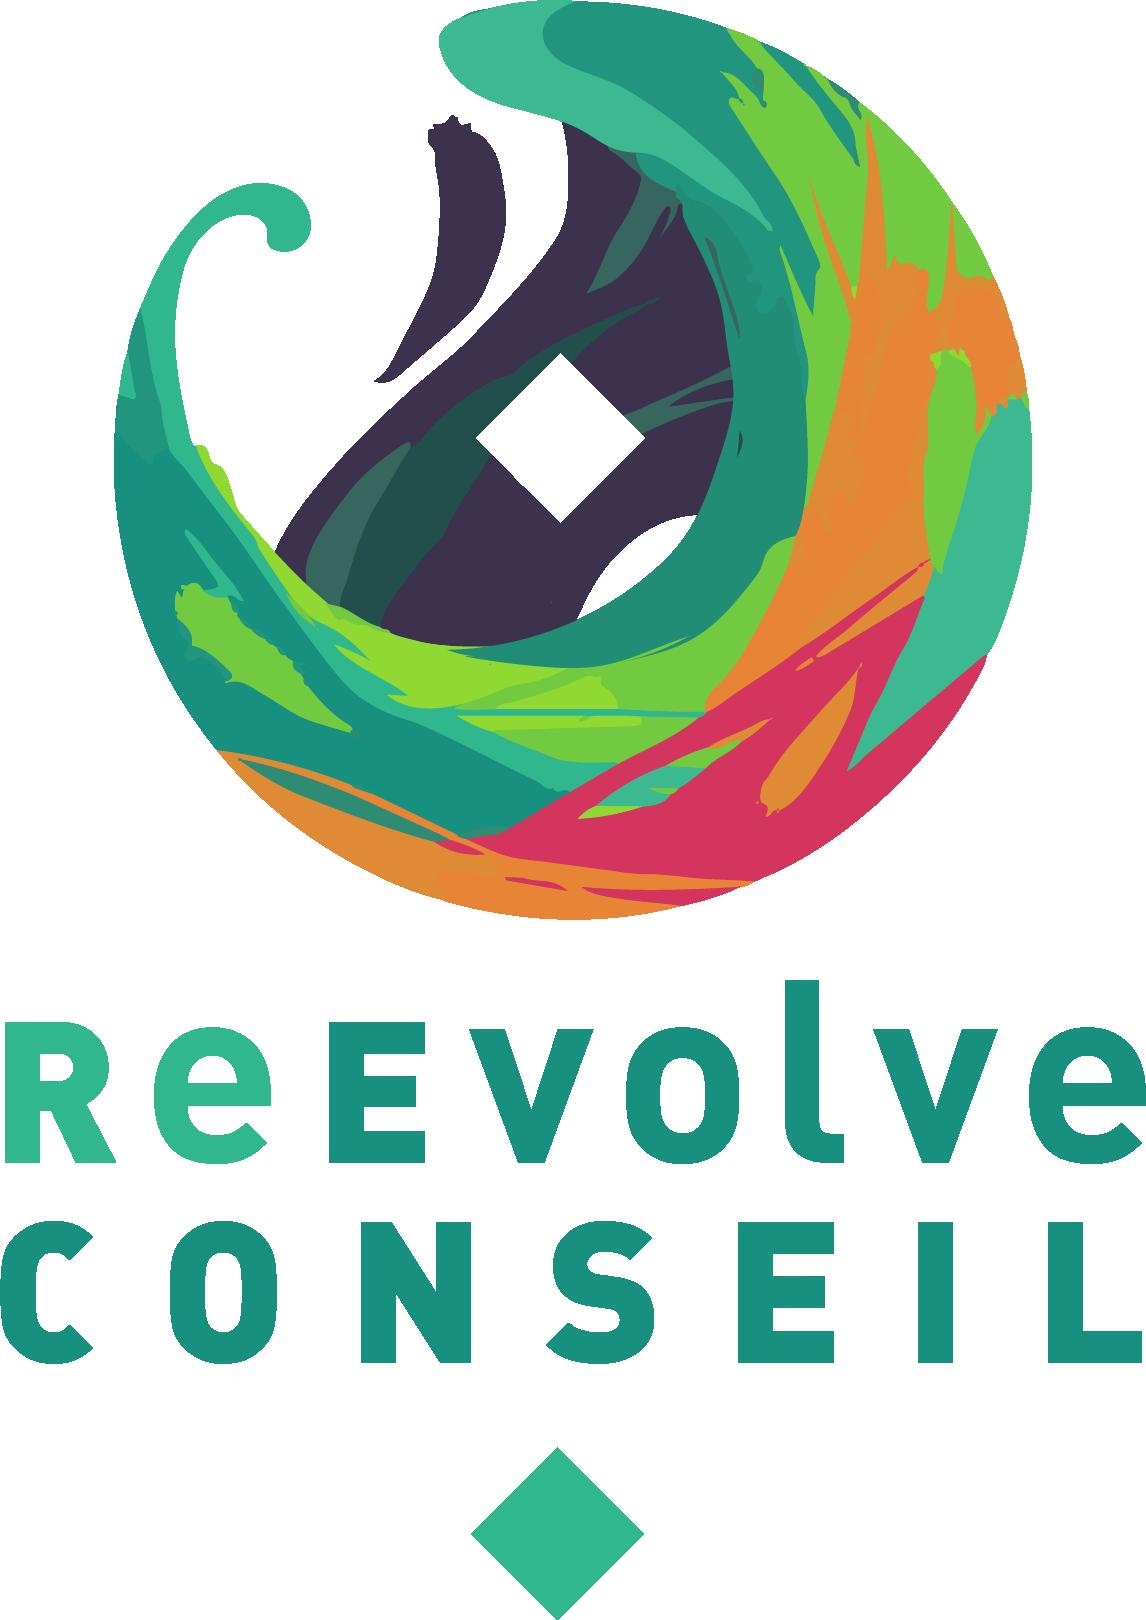 ReEvolve Conseil